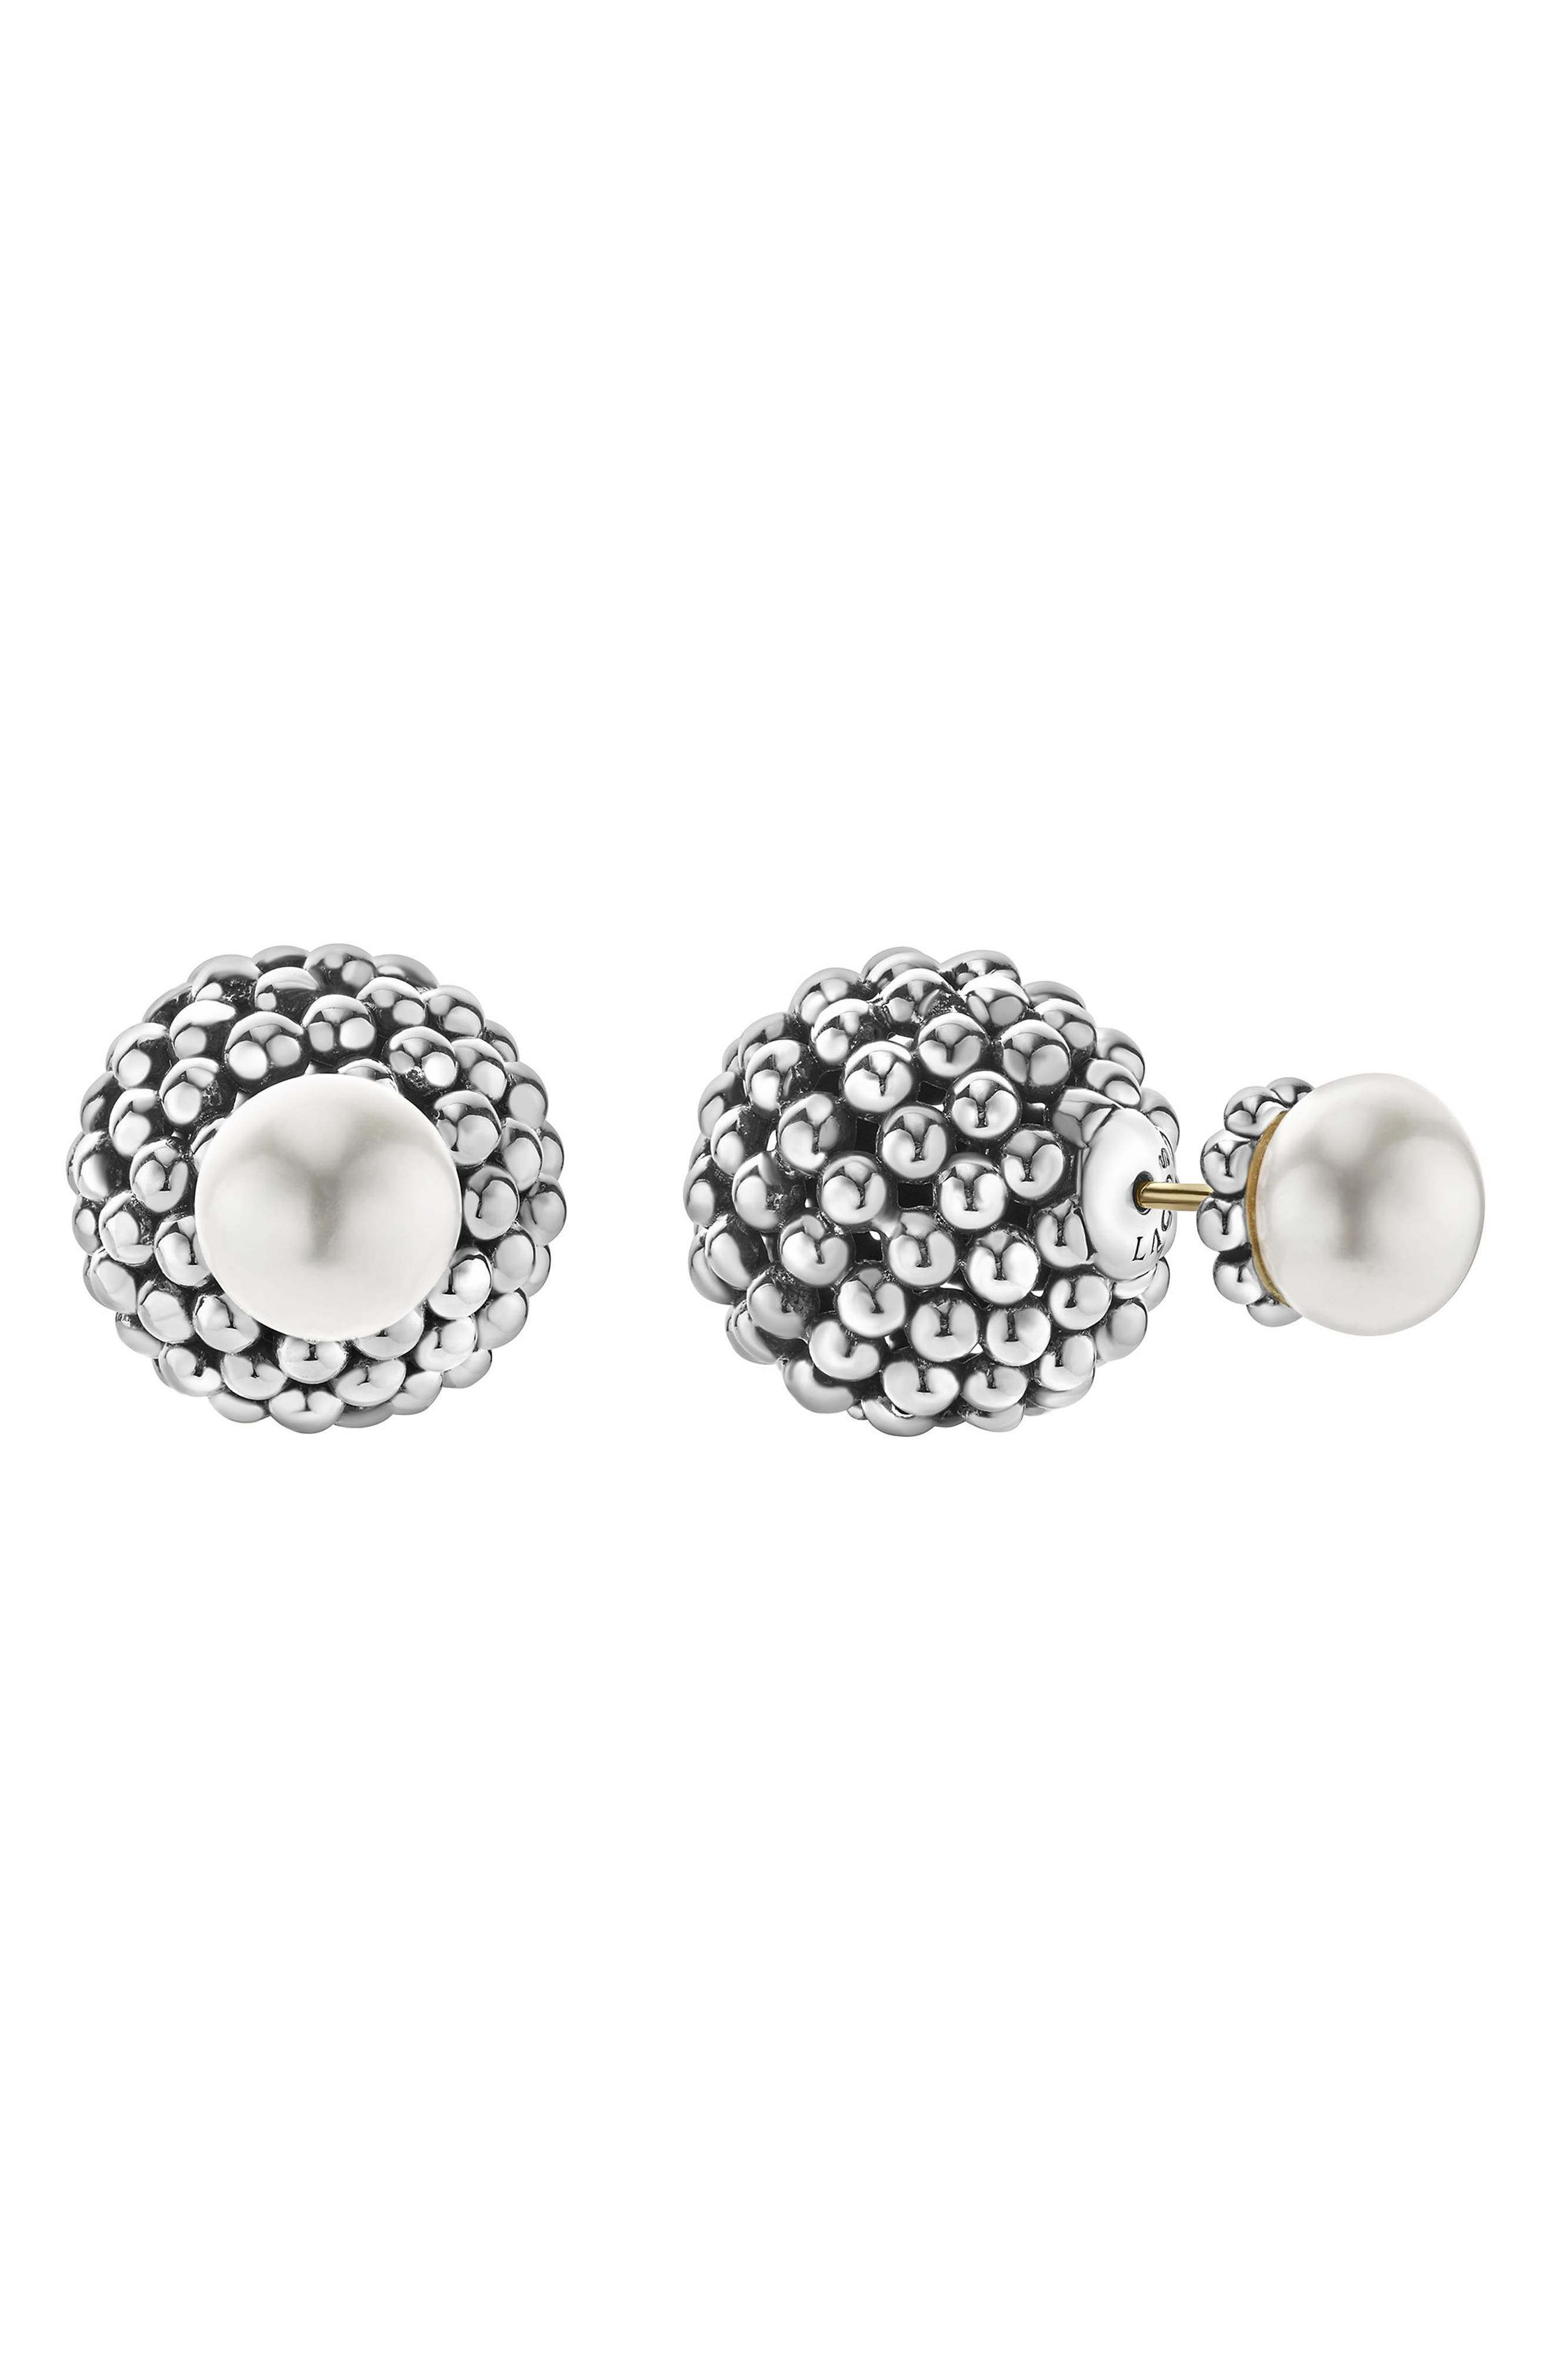 Caviar & Pearl Stud Earrings,                             Alternate thumbnail 2, color,                             Pearl